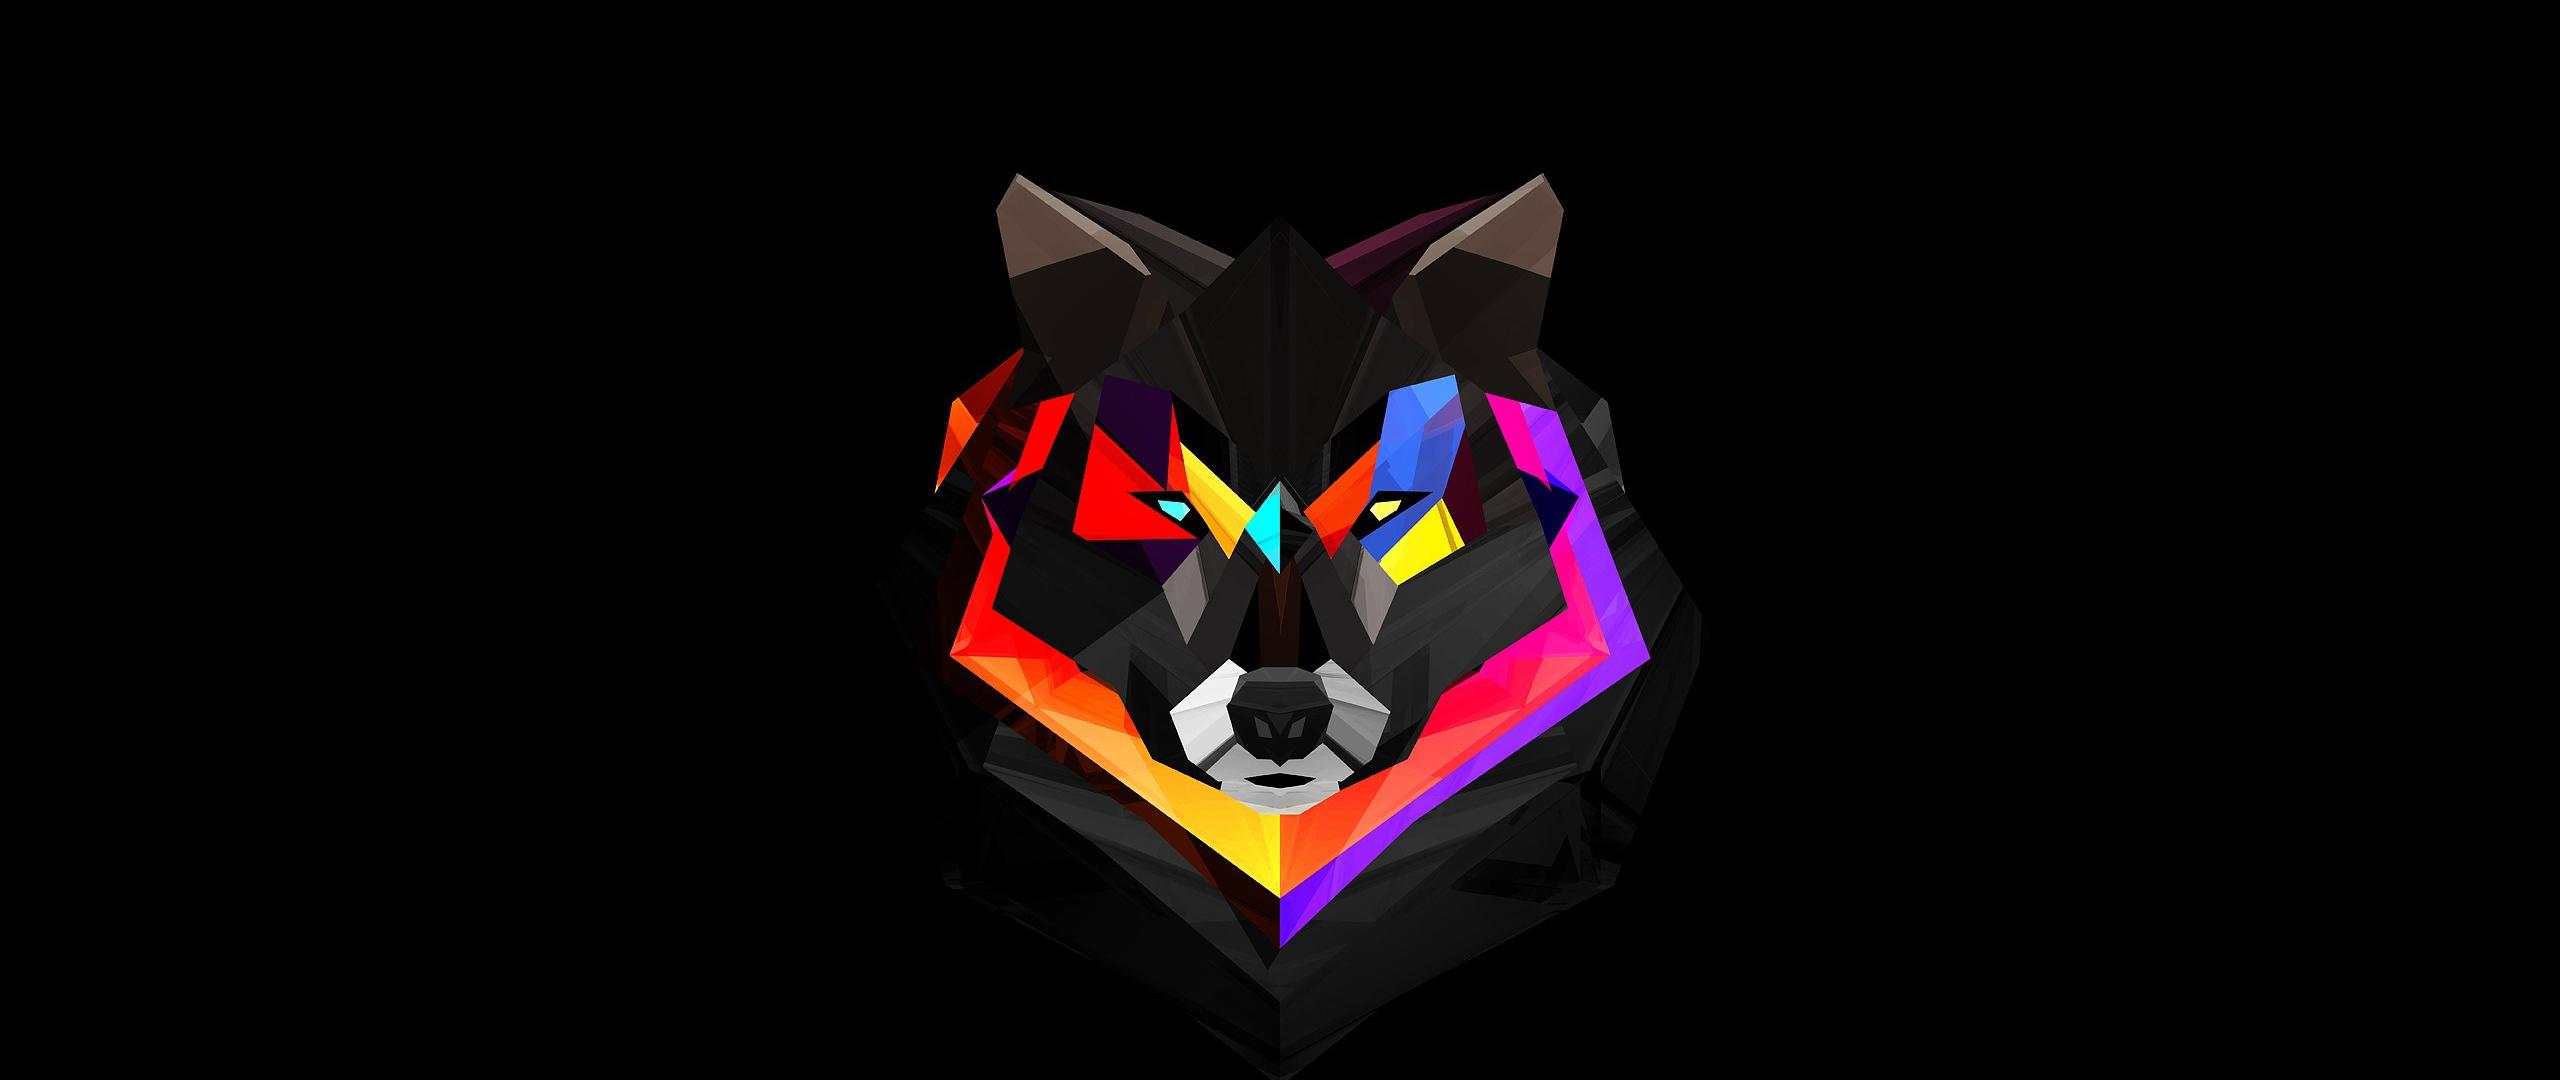 General 2560x1080 wolf red digital art artwork simple background Facets